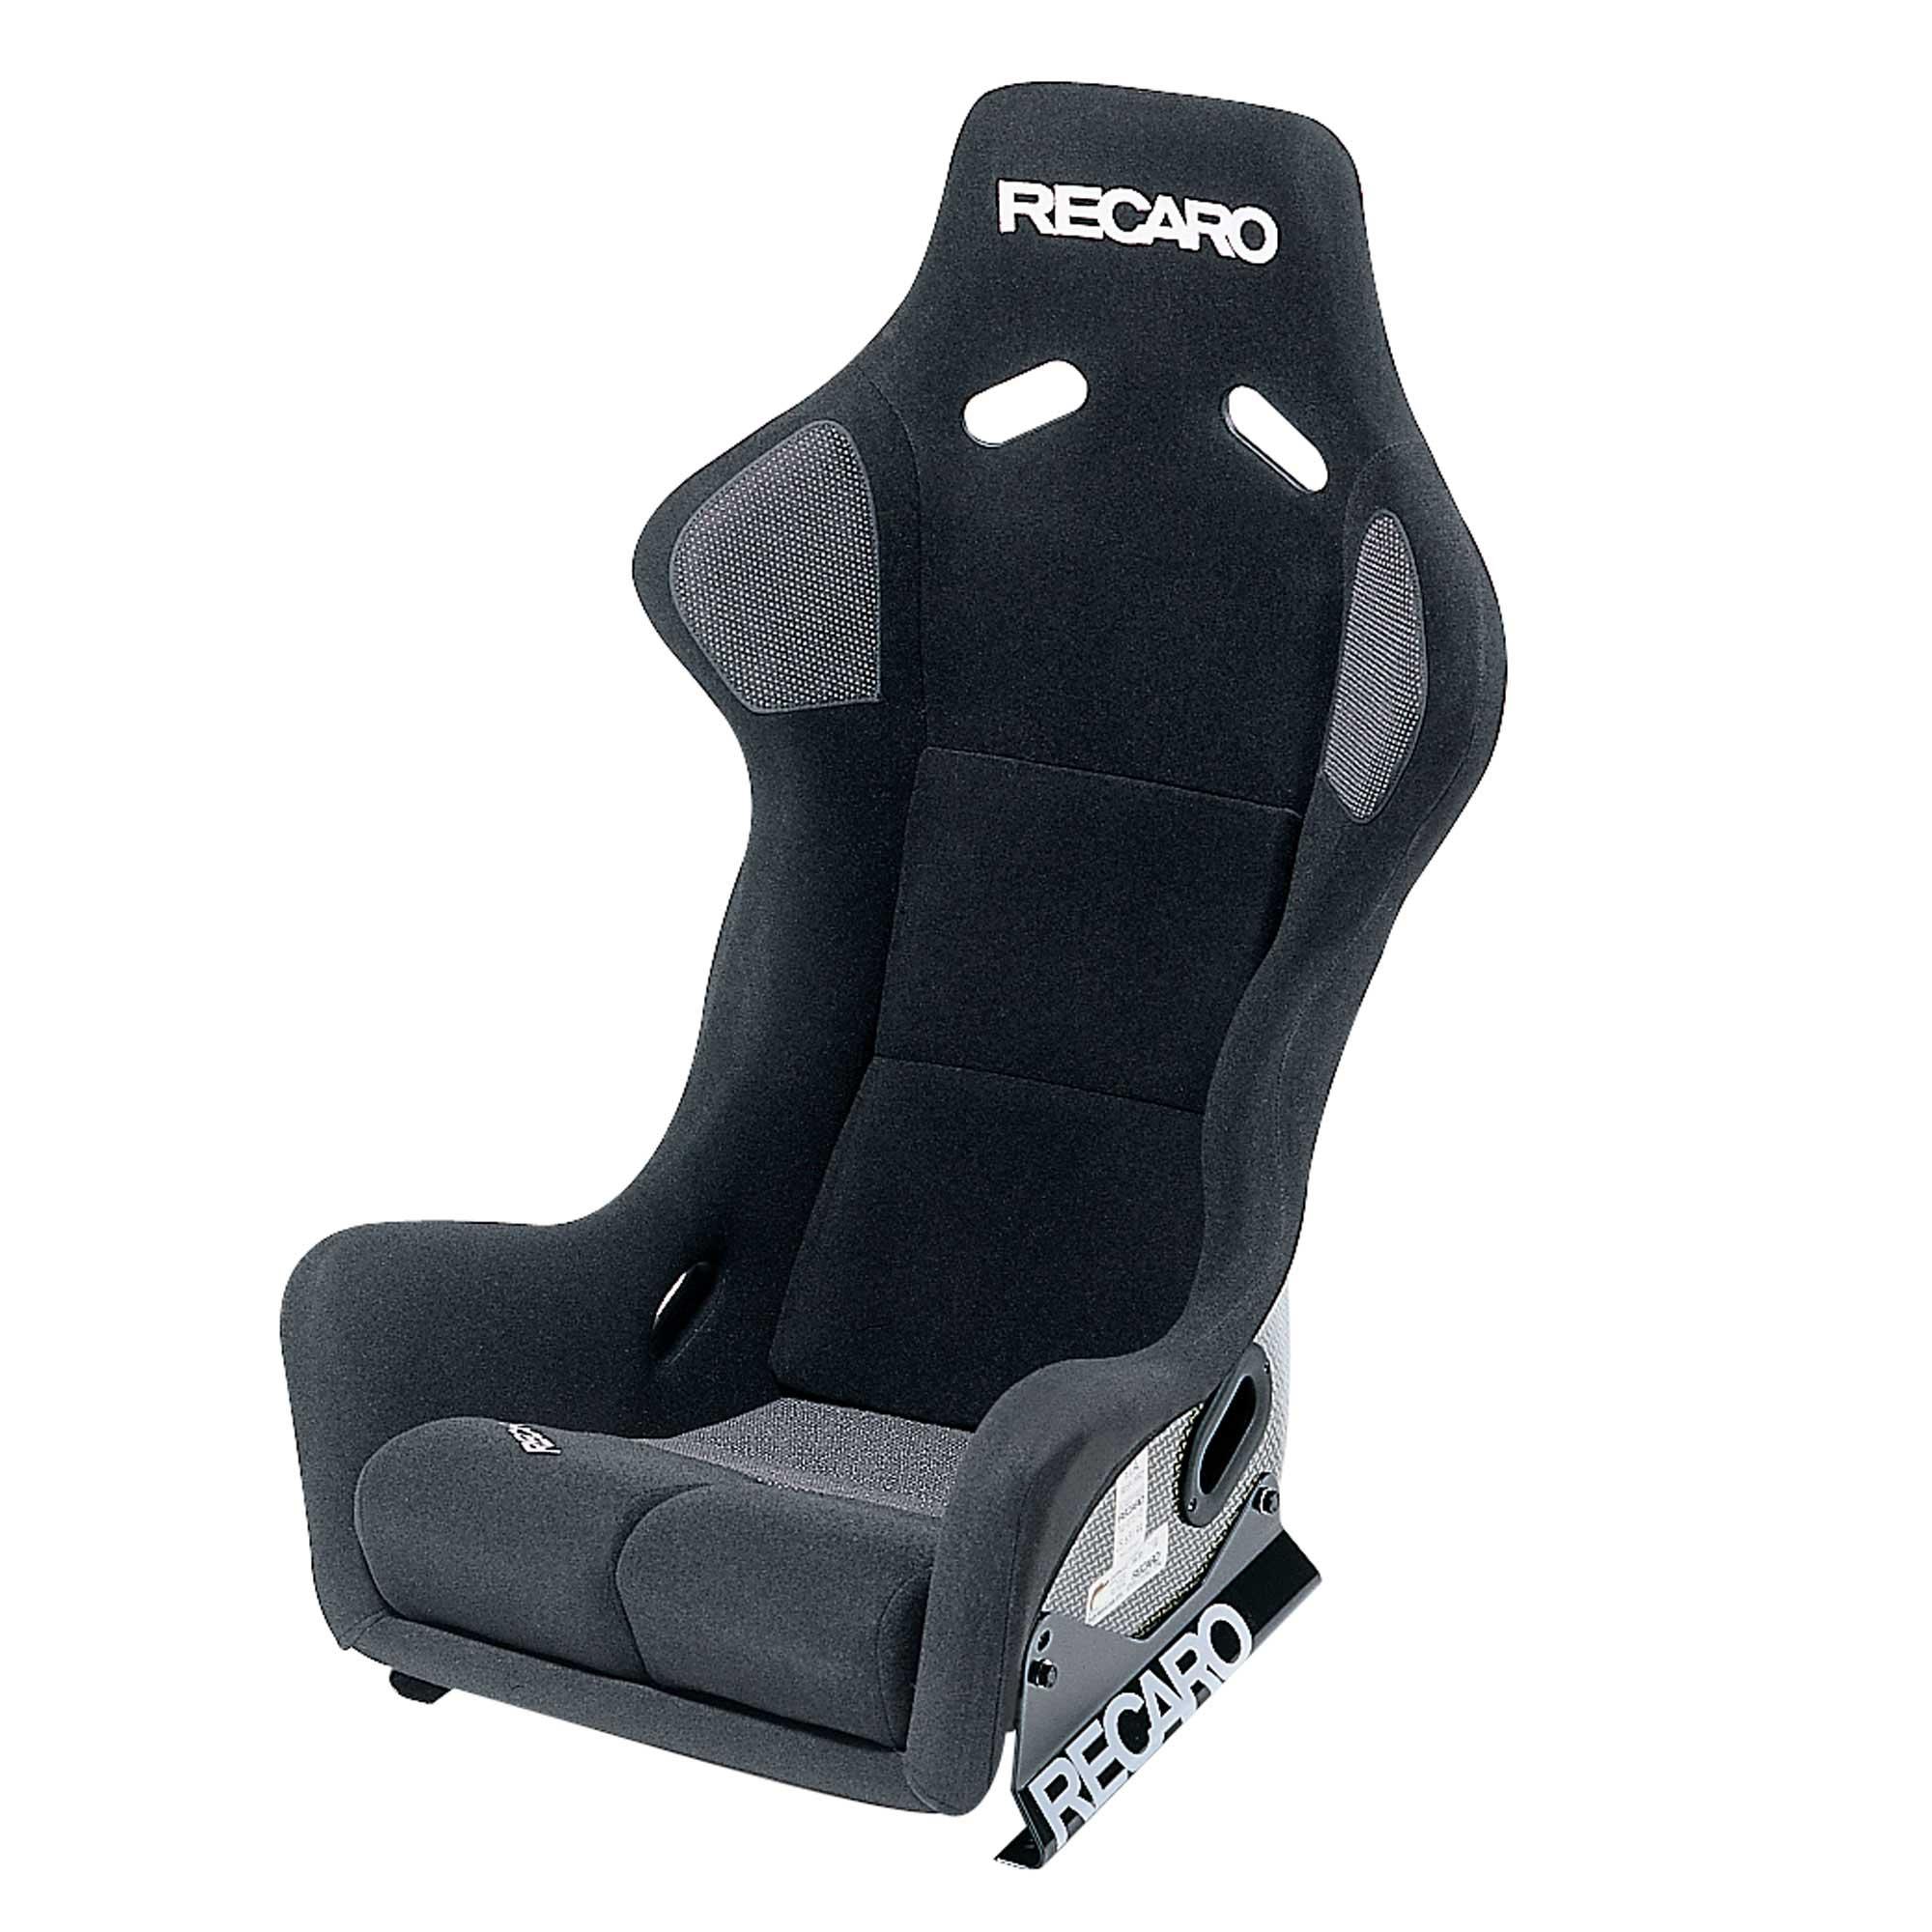 RECARO PROFI SP A CARBONKEVLAR SEAT